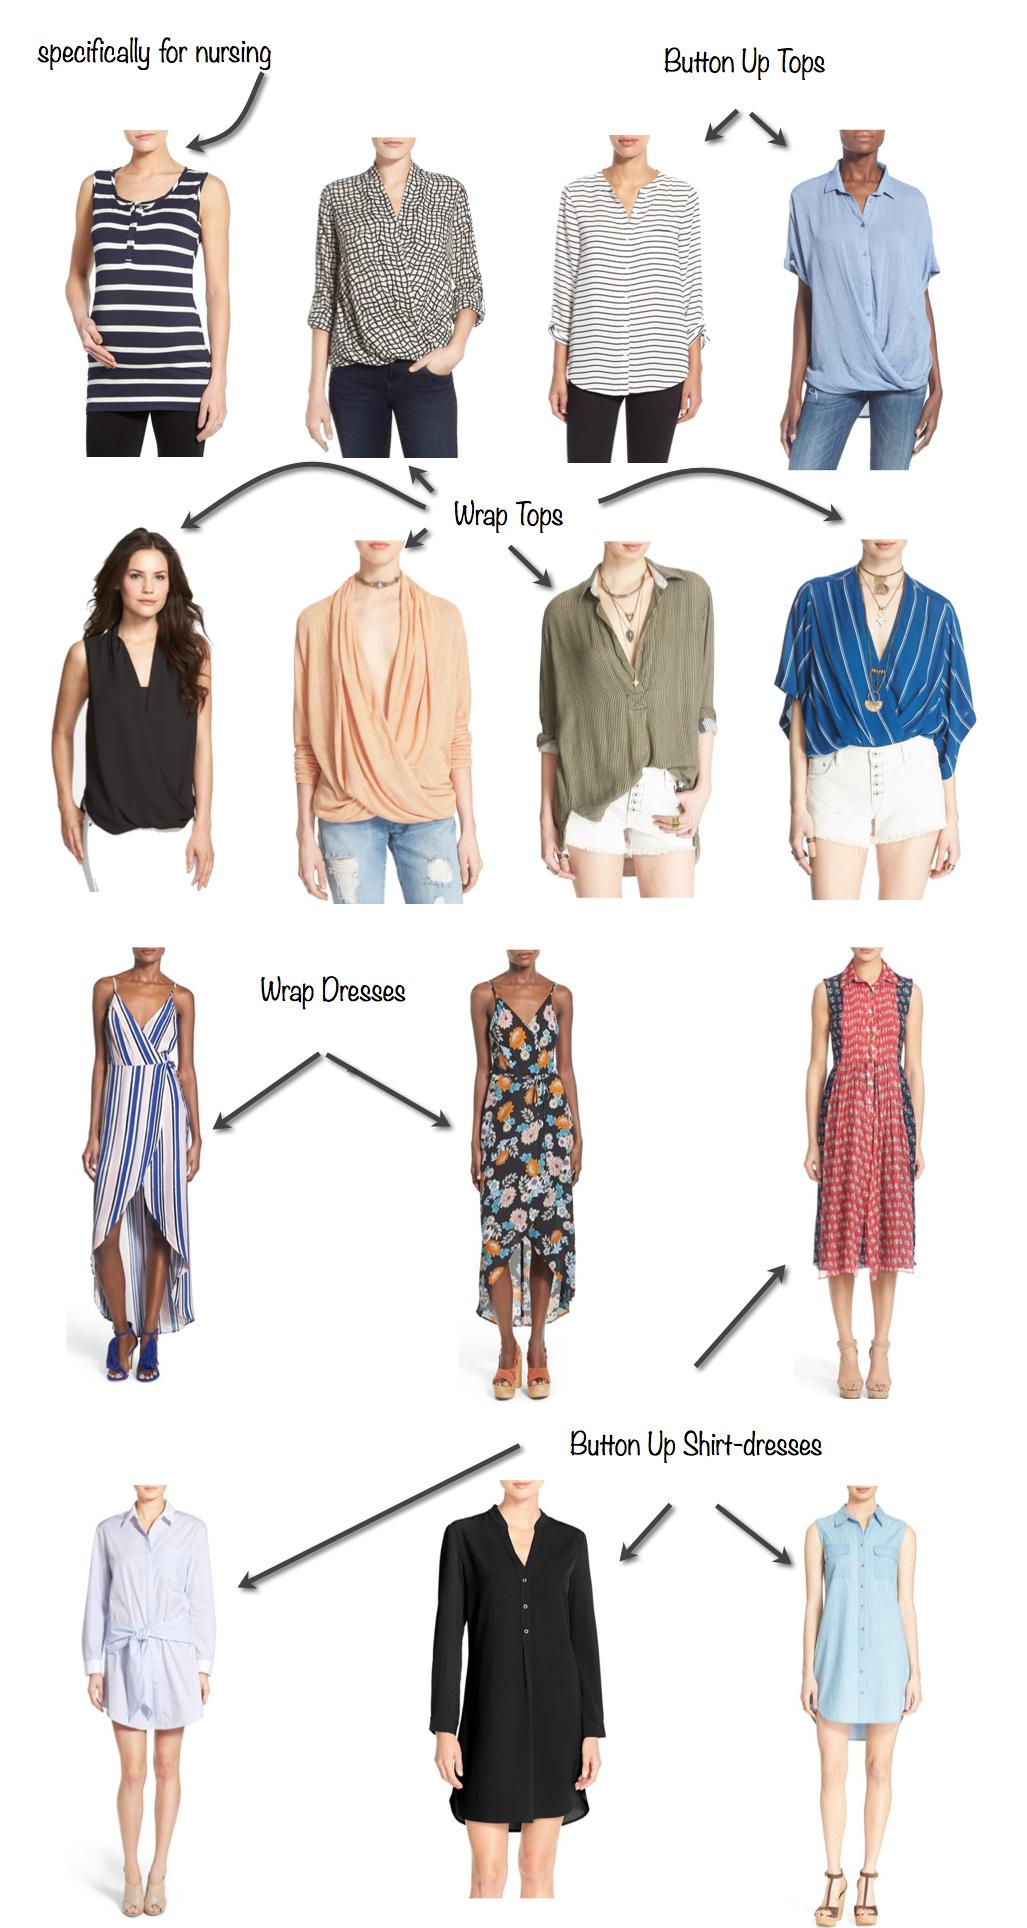 e71e868ca1e The Best Nursing Tops And Dresses… That Aren t Nursing Tops and ...